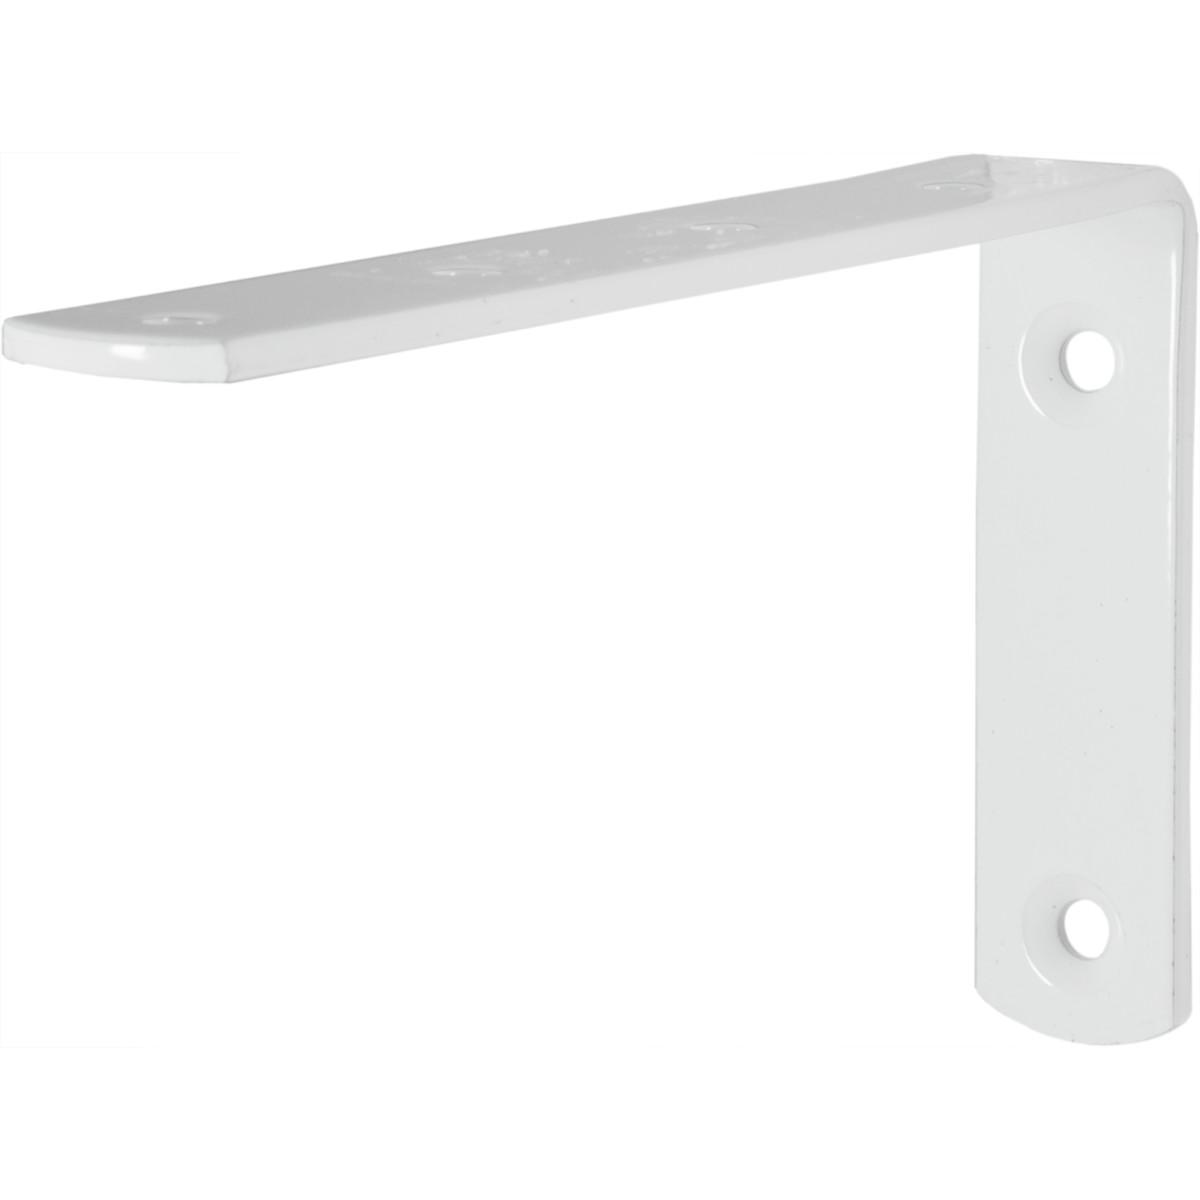 Кронштейн Angle 75x125 мм цвет белый